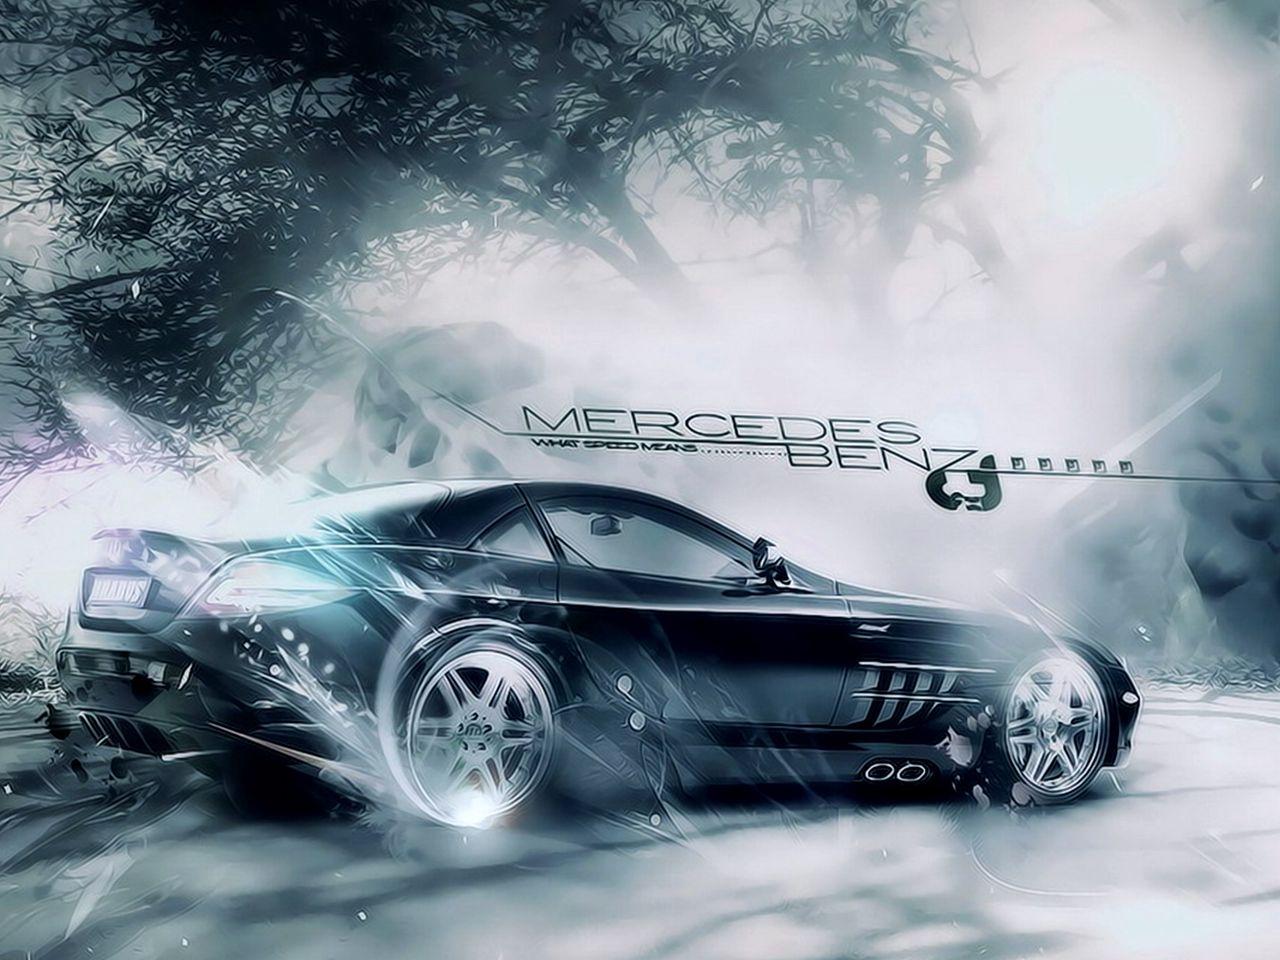 2012 mercedes benz c63 amg car wallpaper wallpaper free download - Black Cars Wallpapers Hd Car Wallpapers